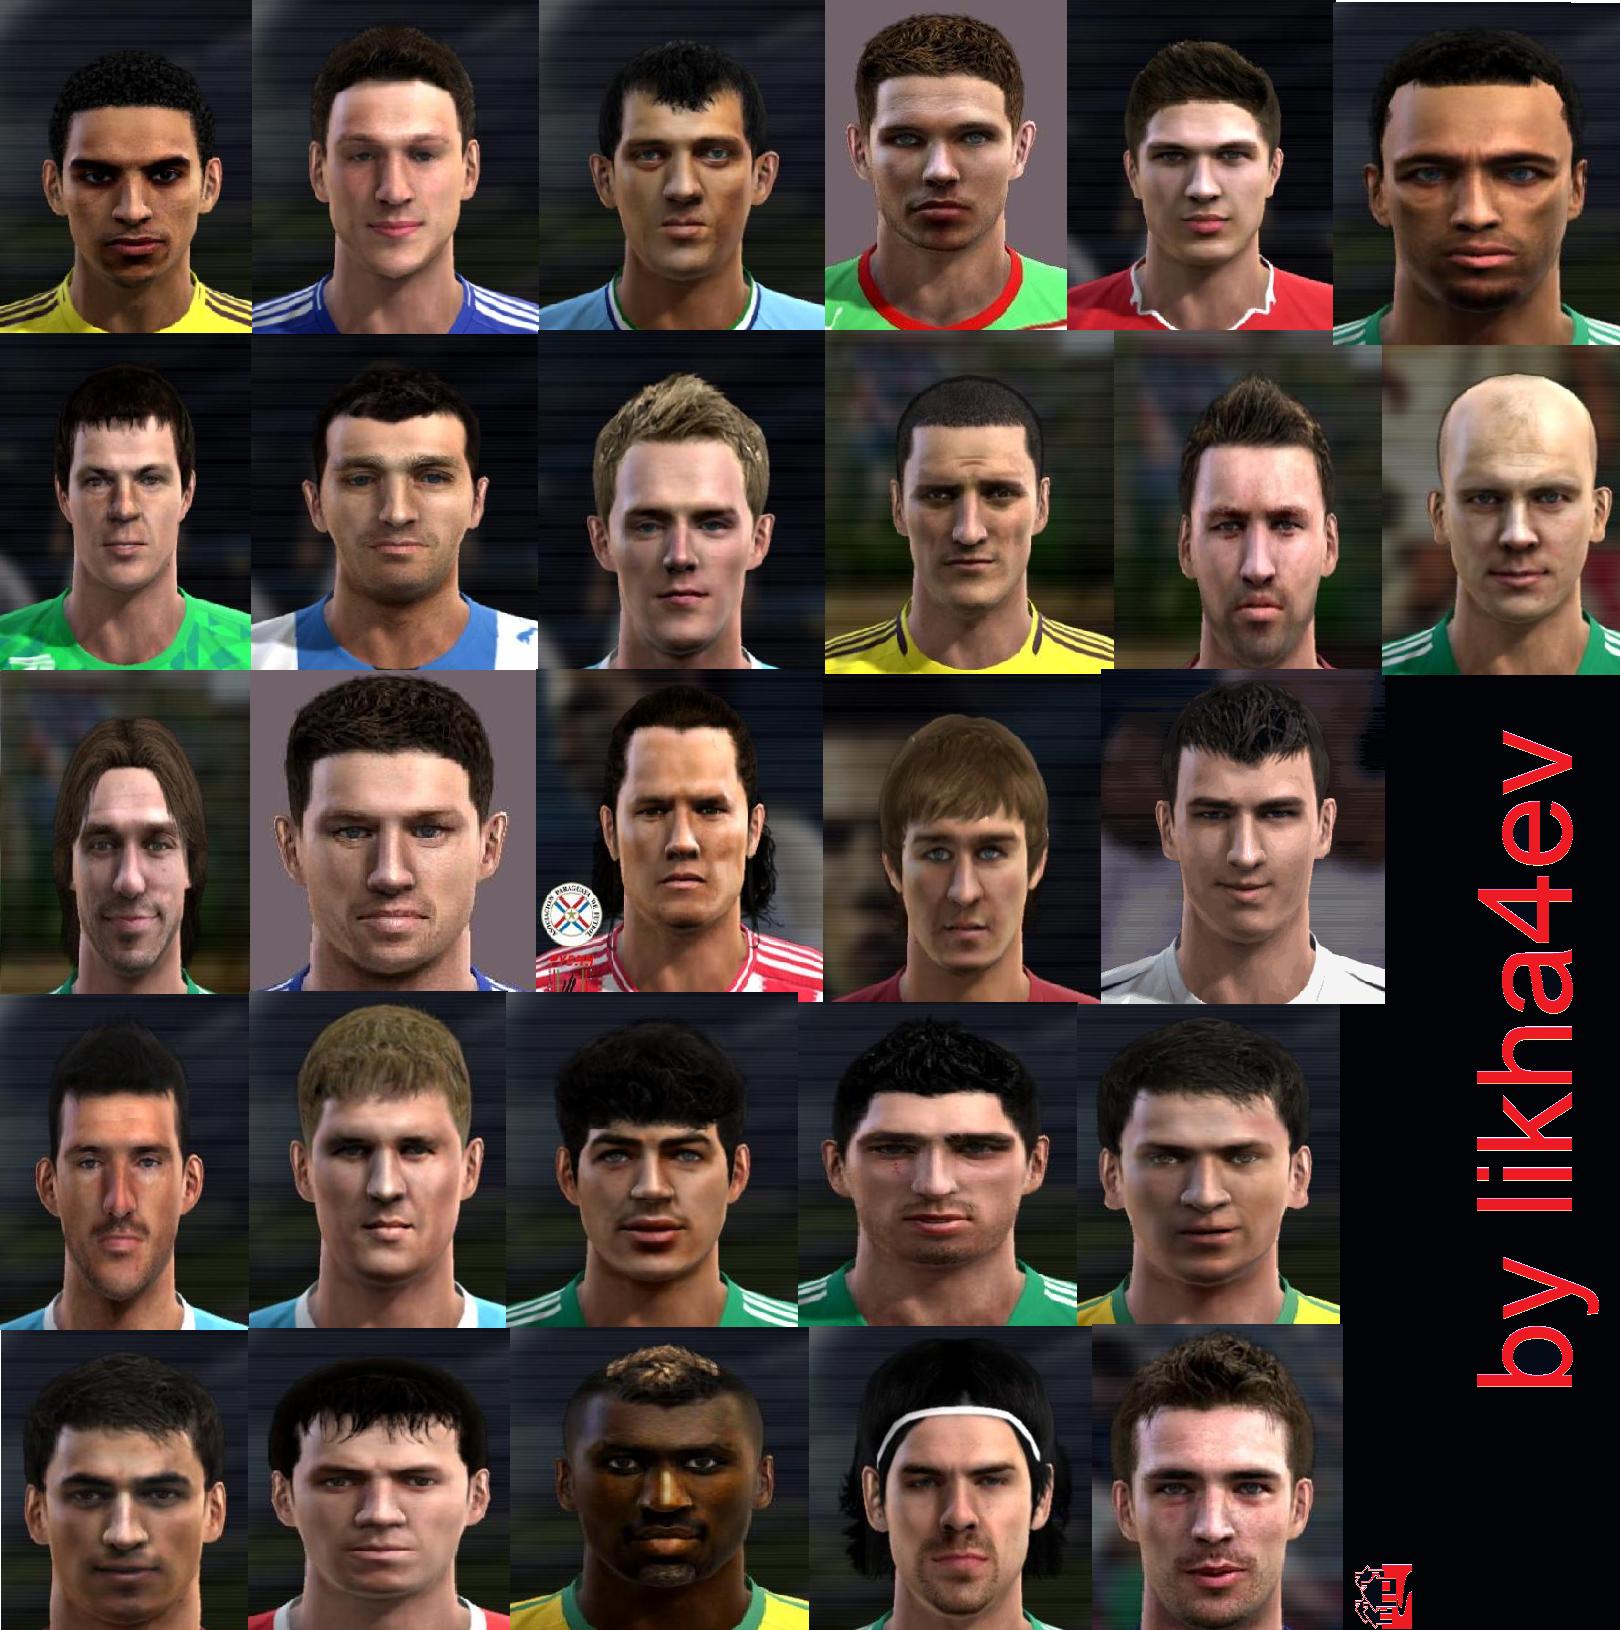 1099 - Pro Evolution Soccer 2012